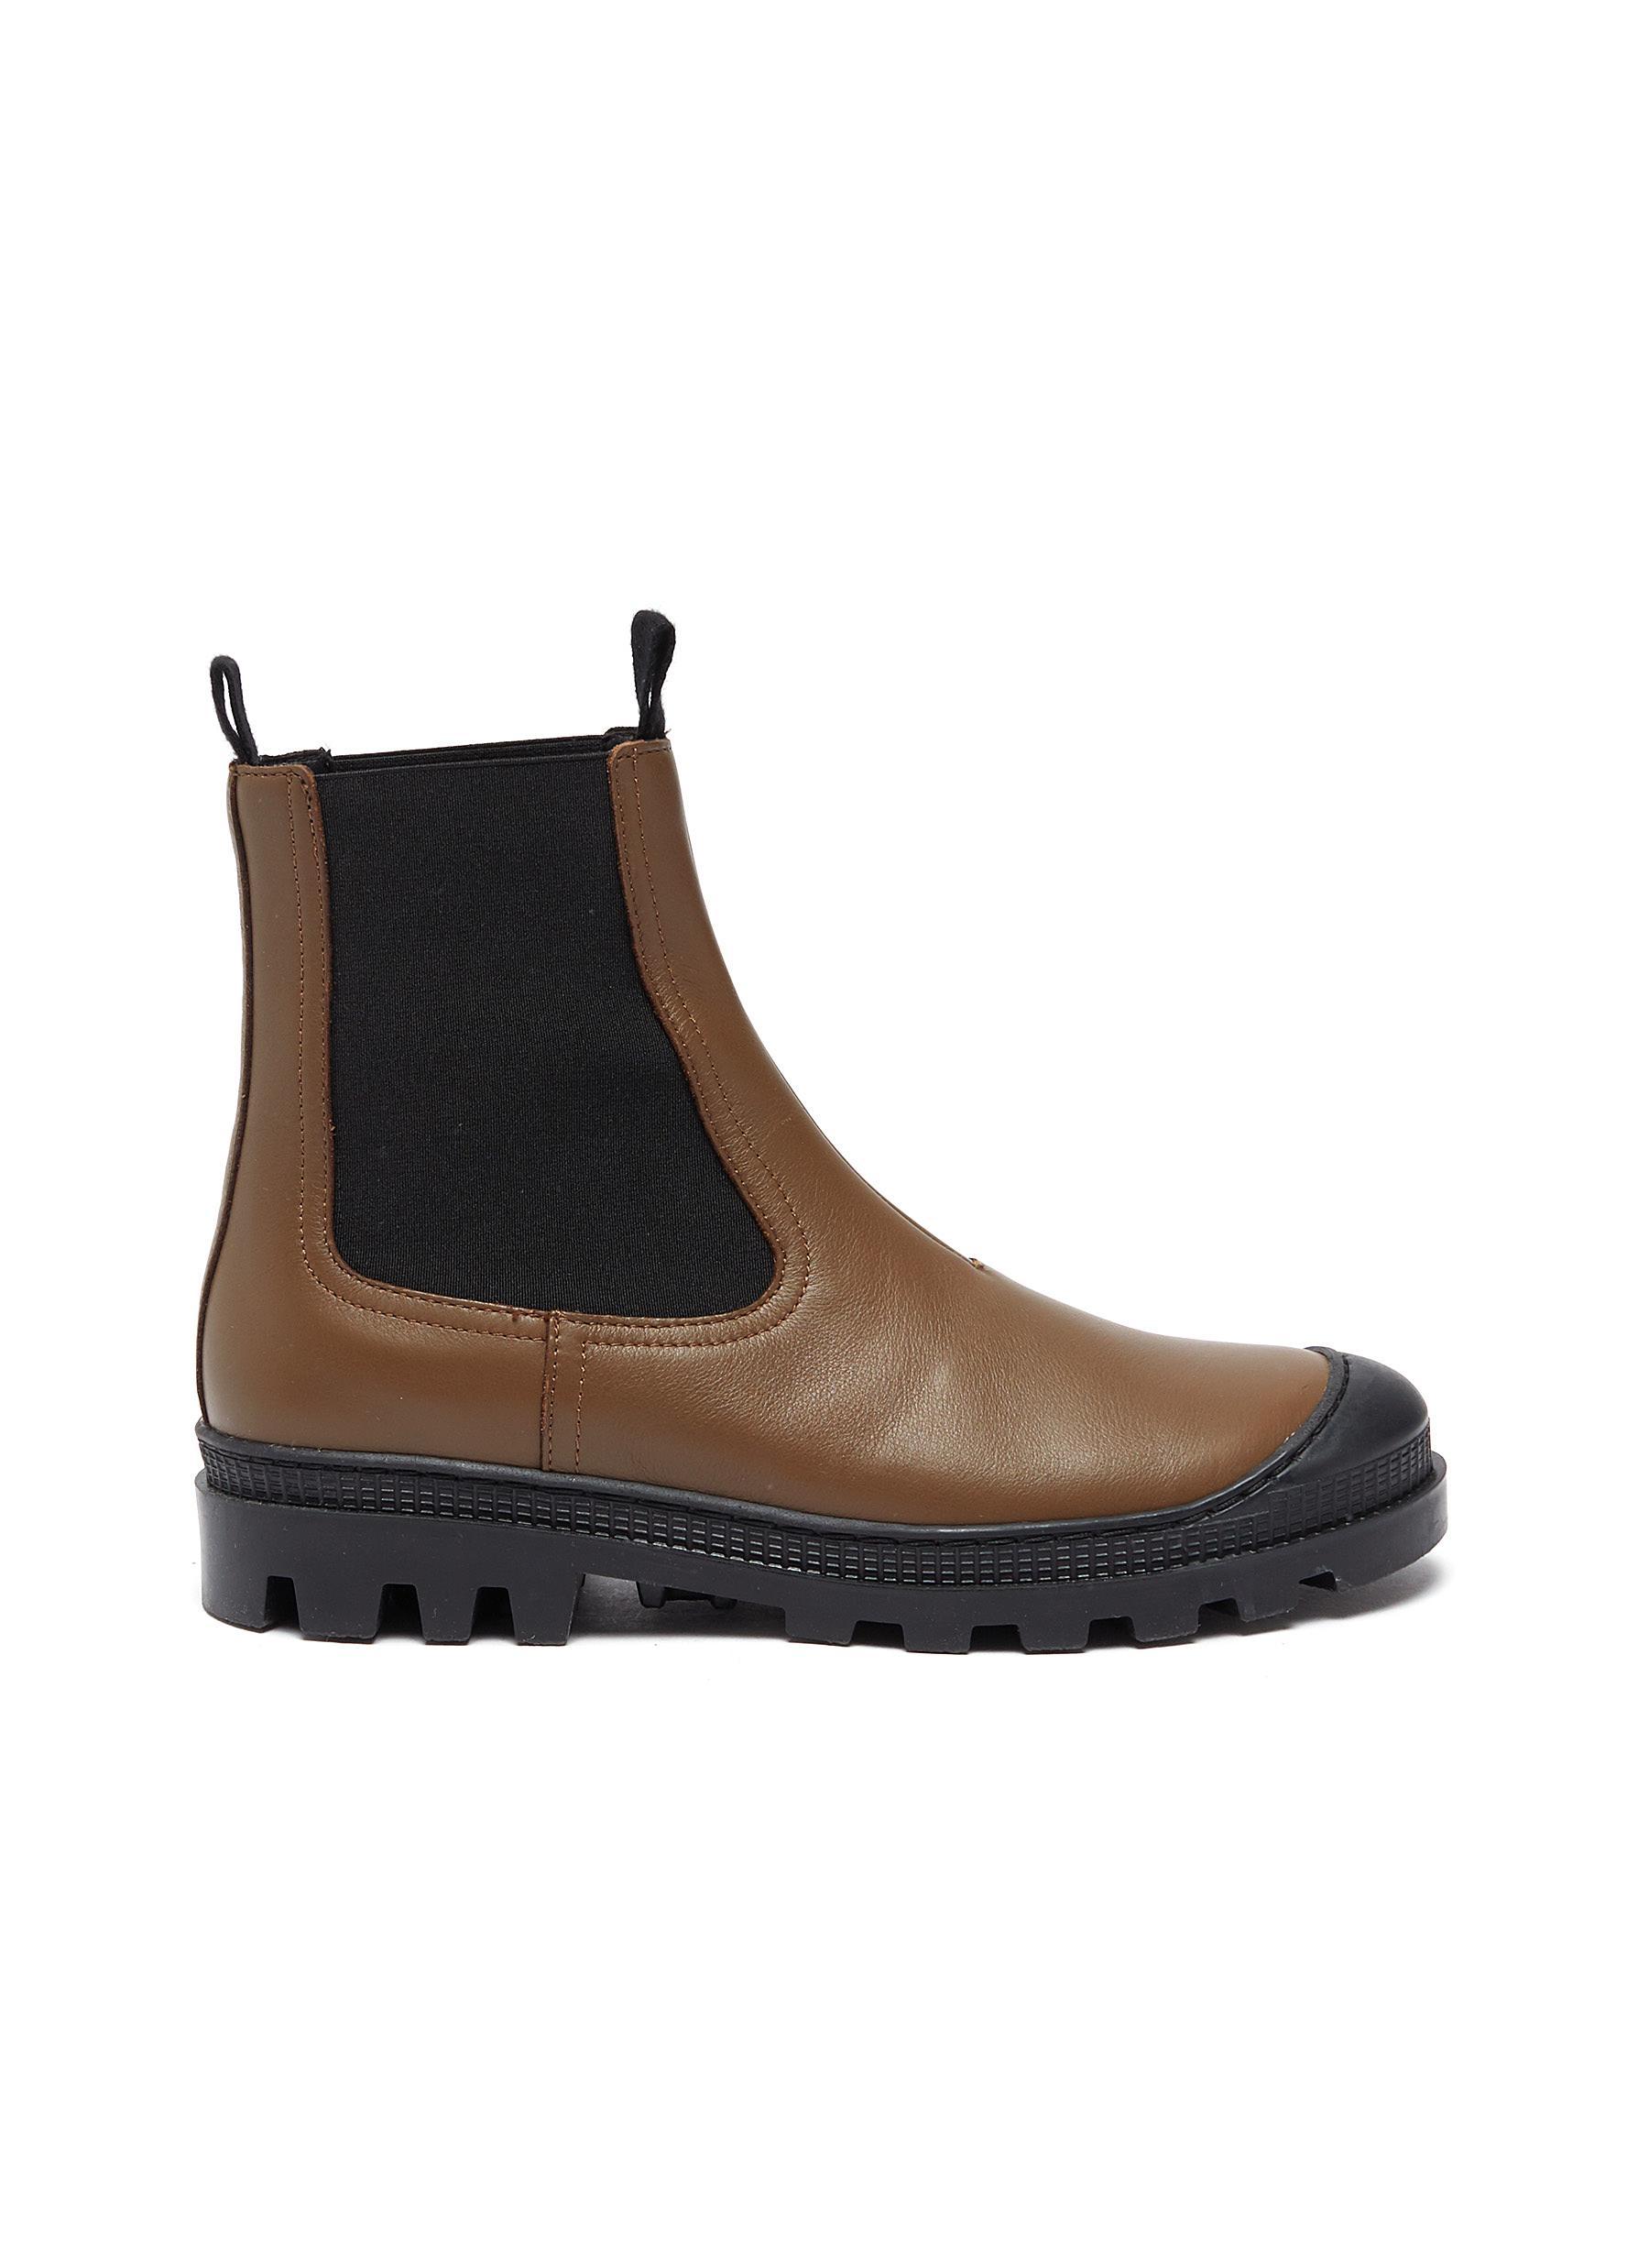 Leather chelsea boots - LOEWE - Modalova